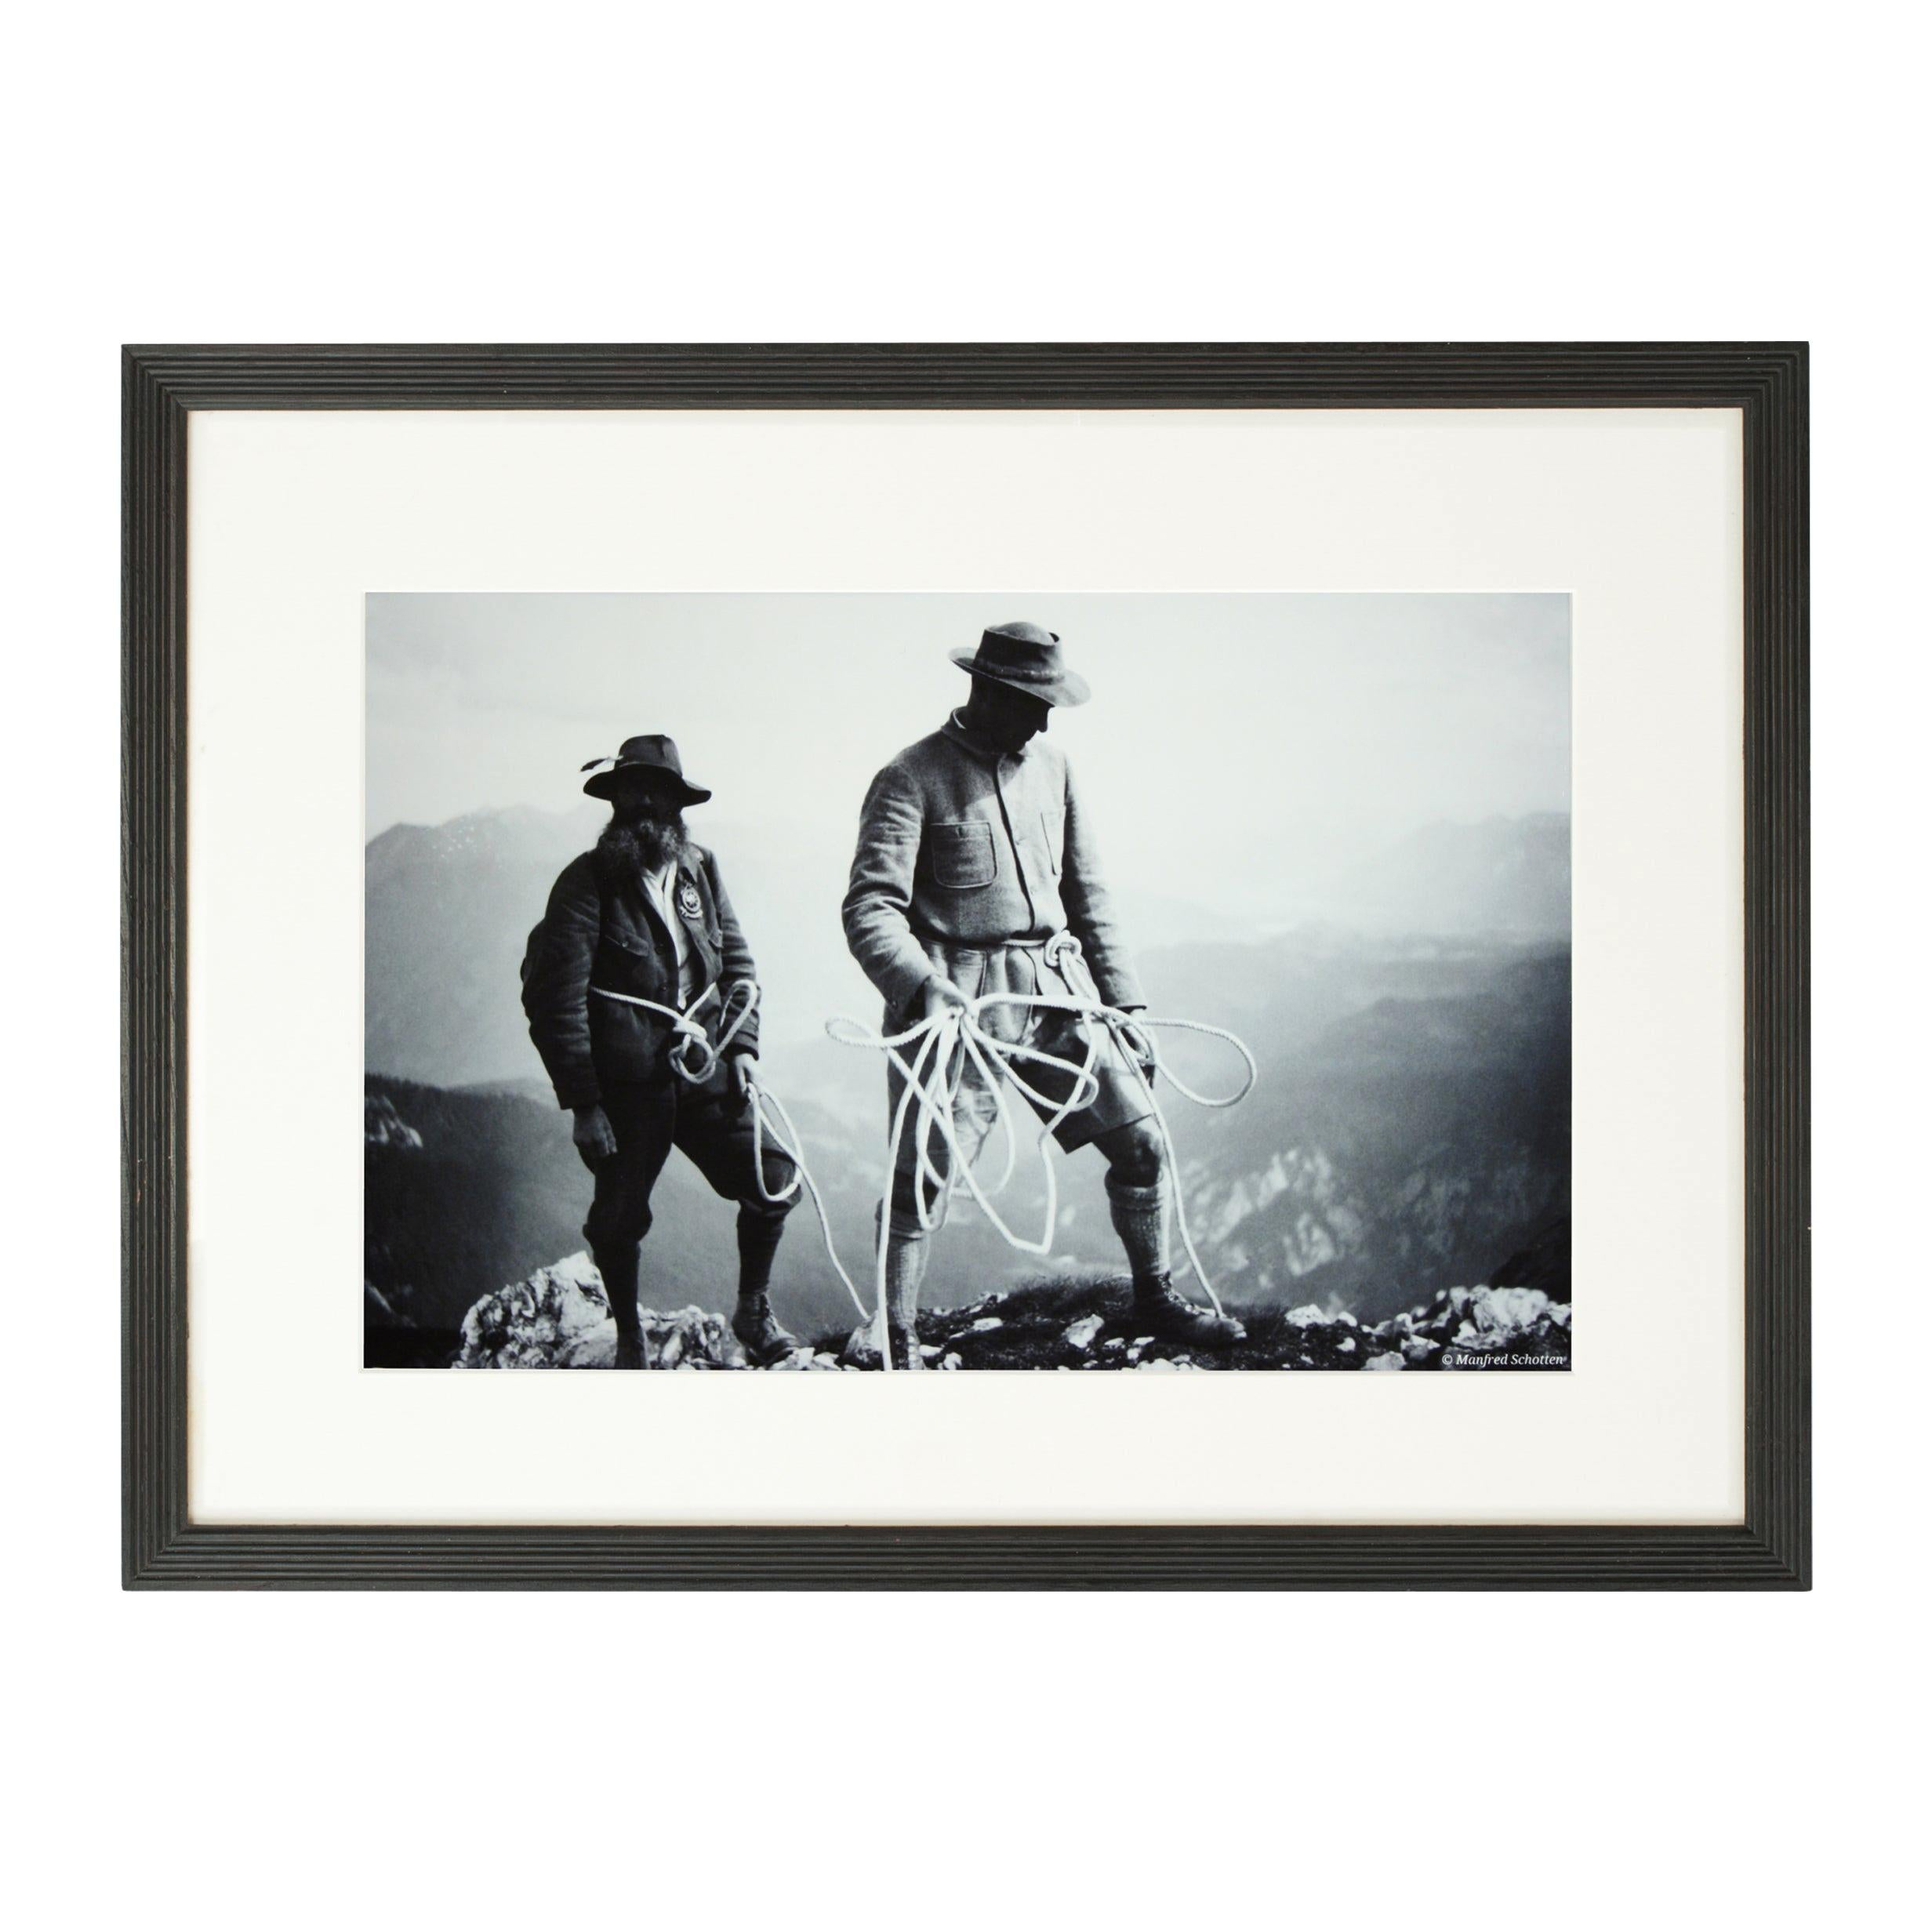 Vintage Style Photography, Framed Alpine Ski Photograph, Safety First